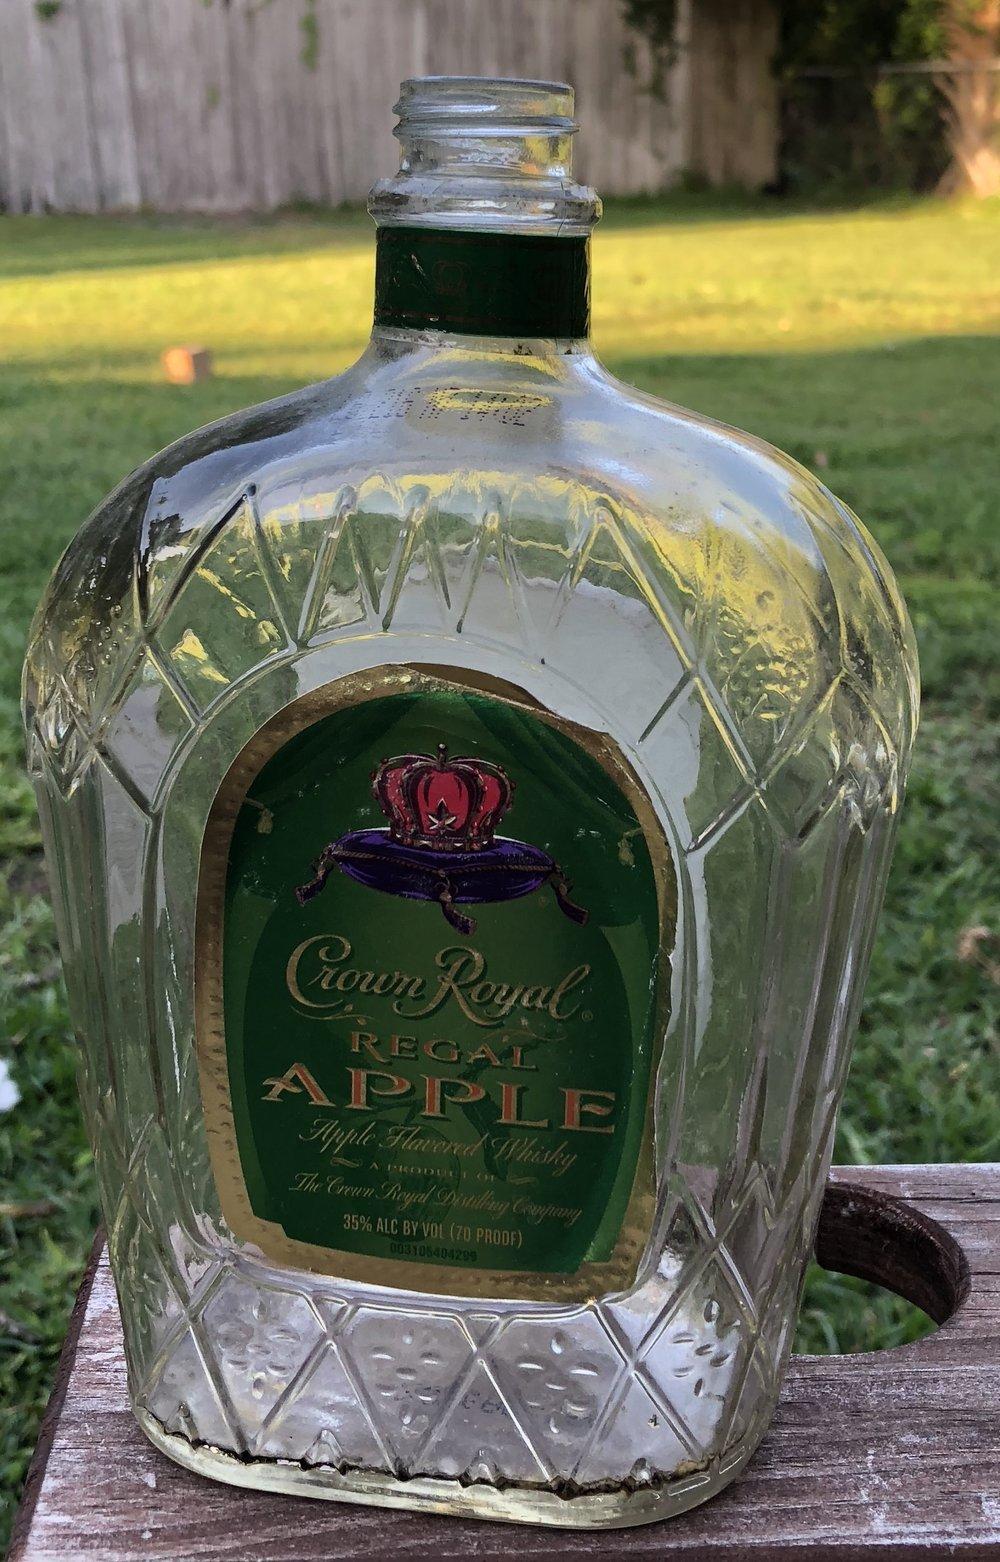 Drown Royal Apple.jpg